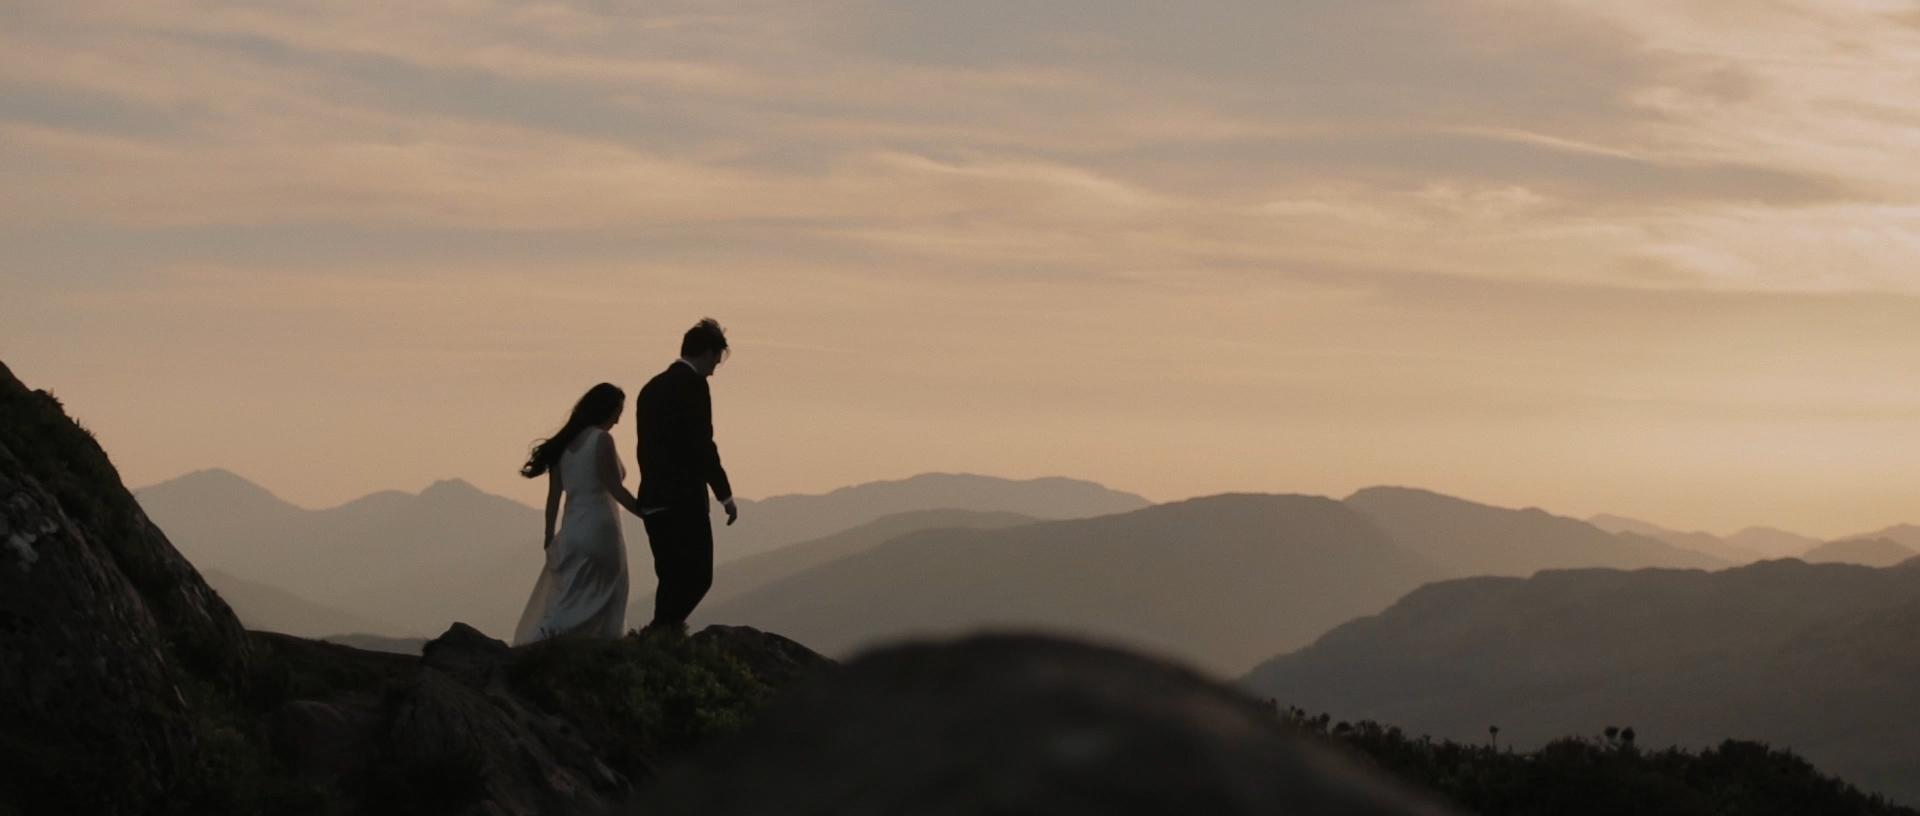 loch-lomond-wedding-videographer_LL_01.jpg